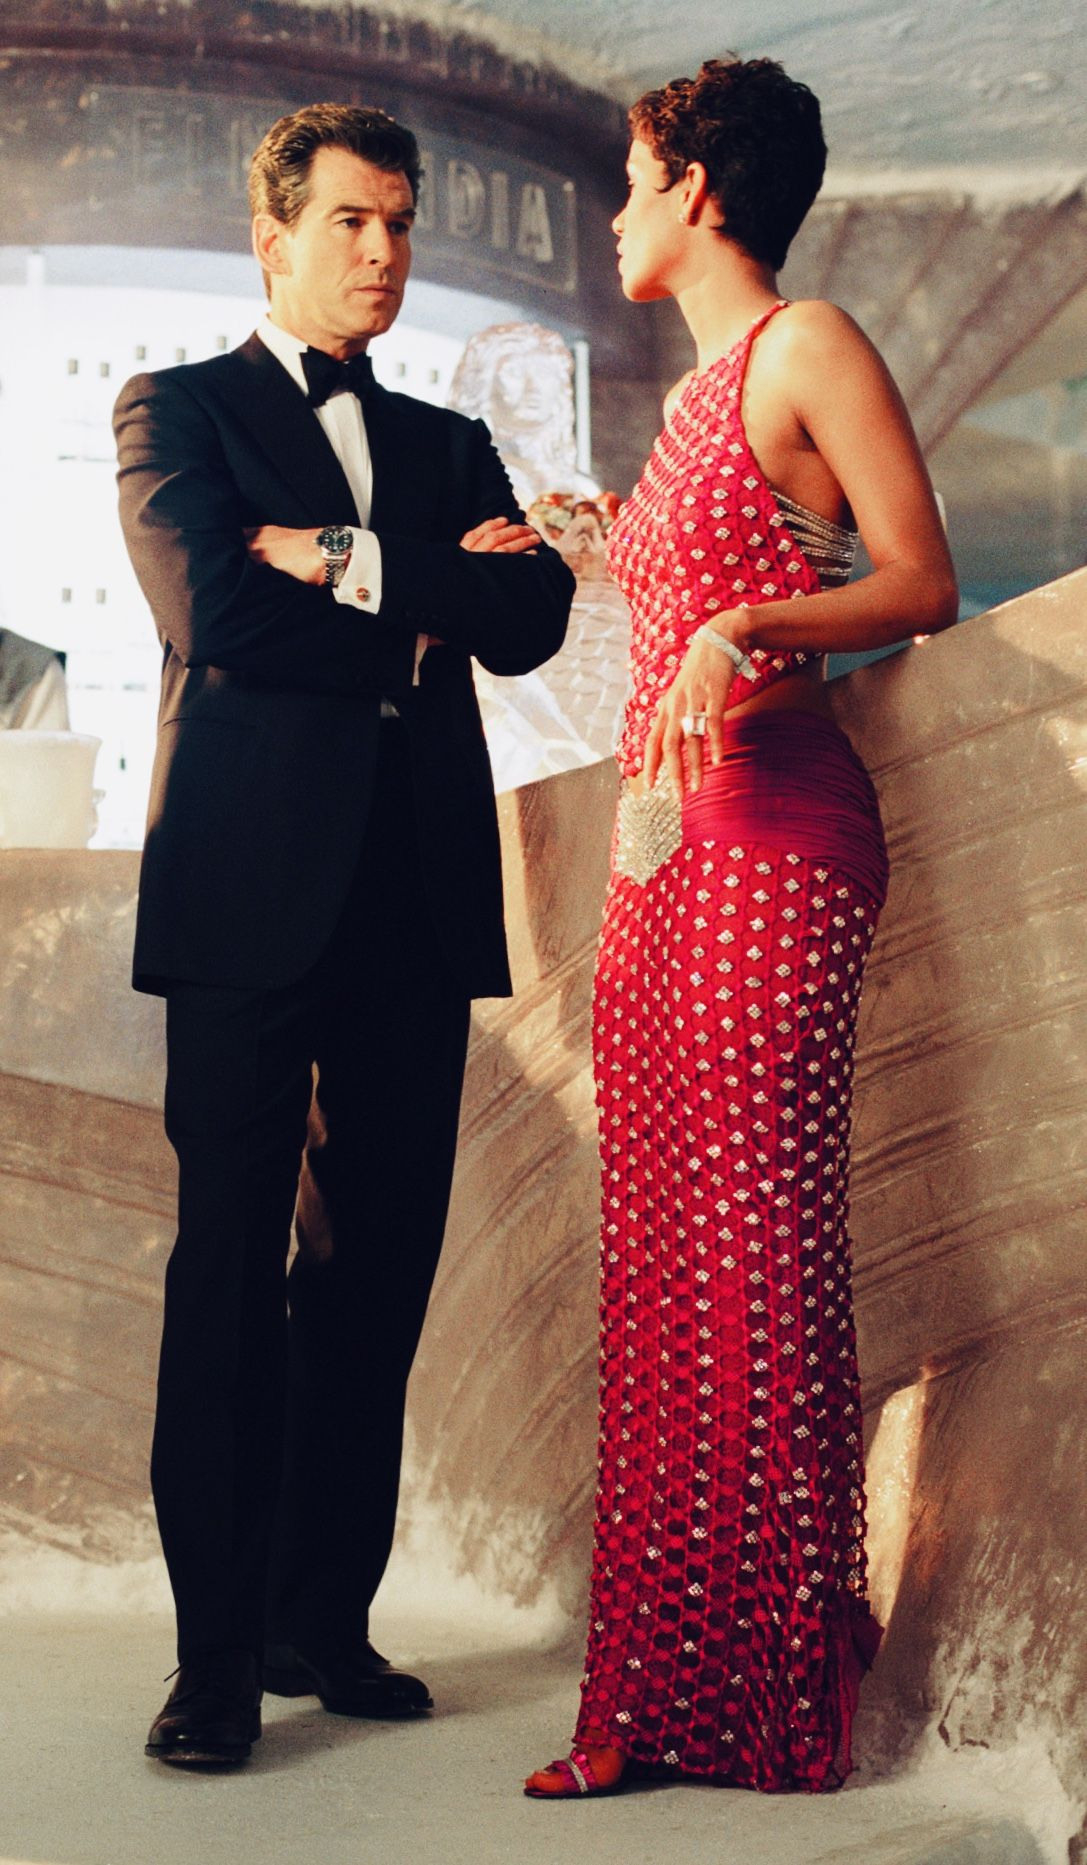 Formal Großartig Abendkleid James Bond Vertrieb10 Coolste Abendkleid James Bond Boutique